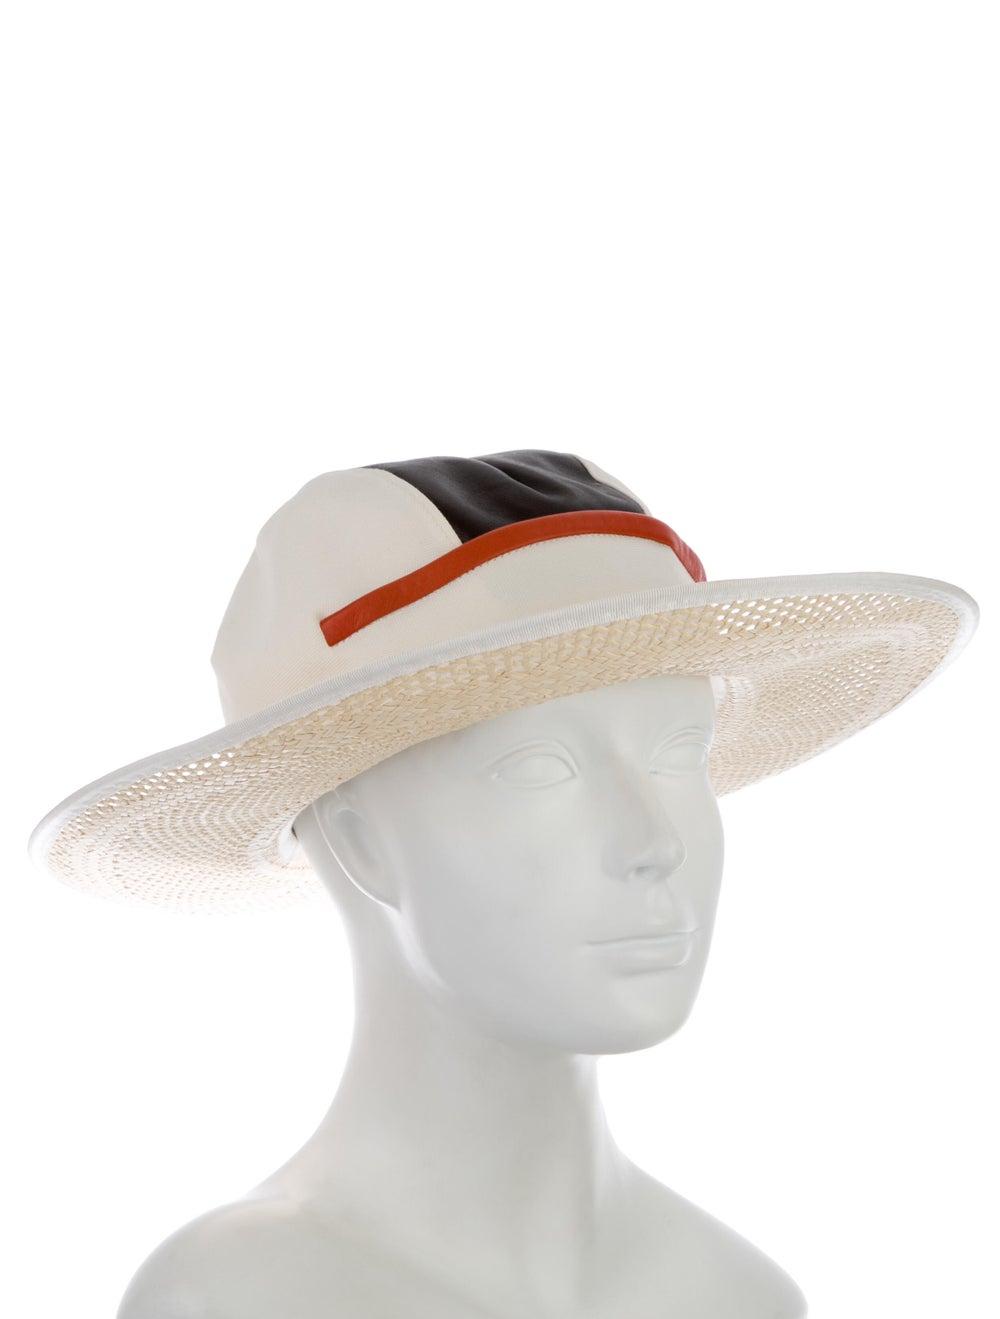 Noel Stewart Straw Wide-Brim Hat multicolor - image 3